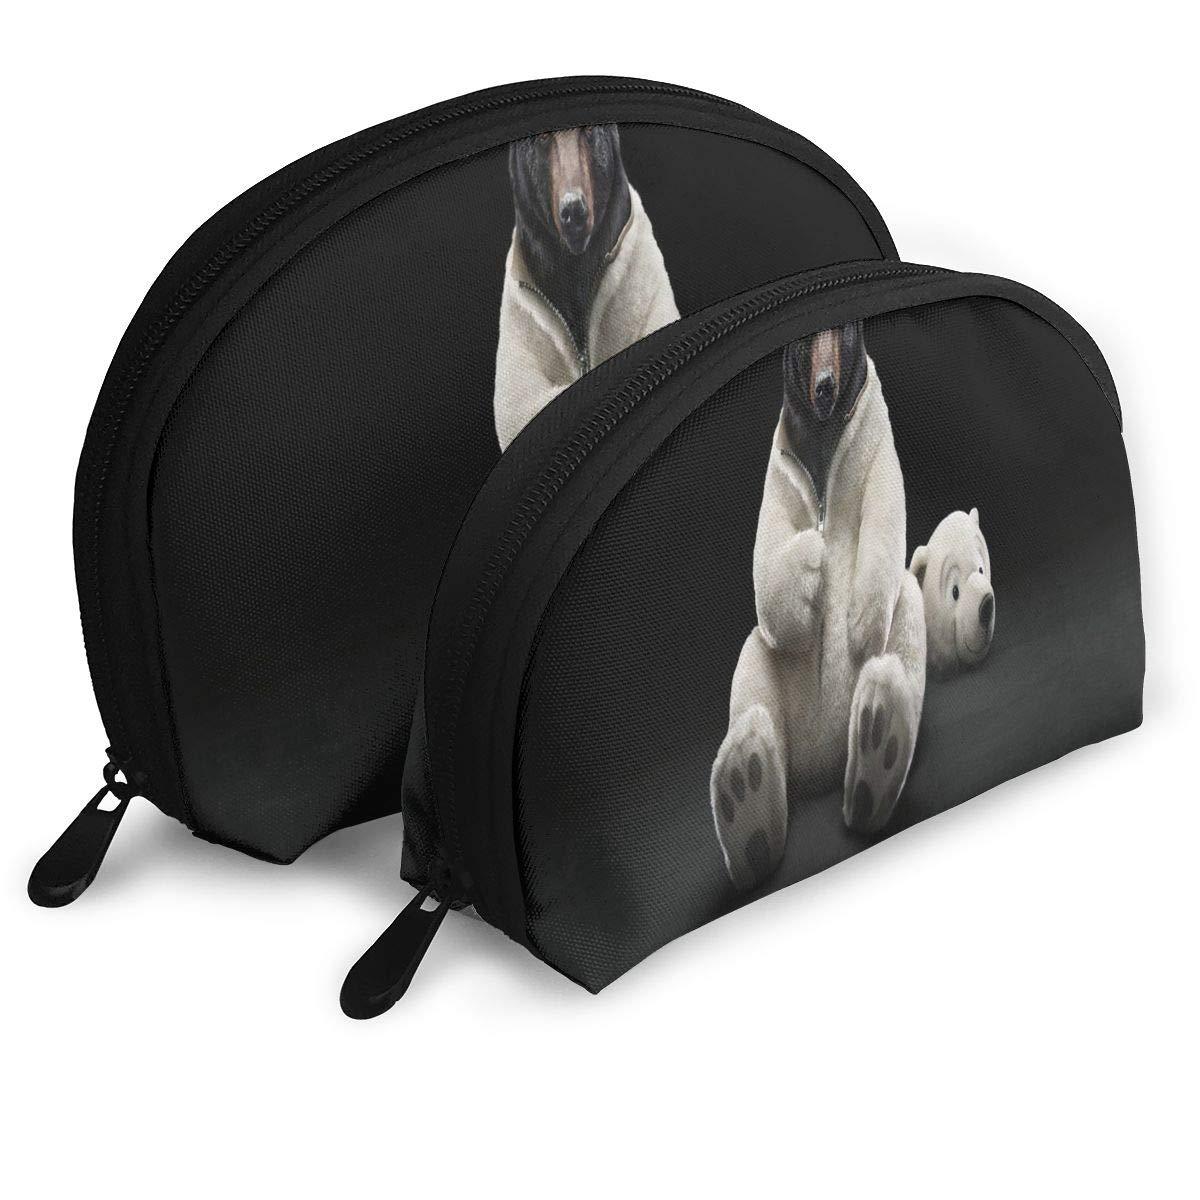 c1619d6bb1b5 Amazon.com : Makeup Bag Undercover Brown White Funny Bear Handy Half ...